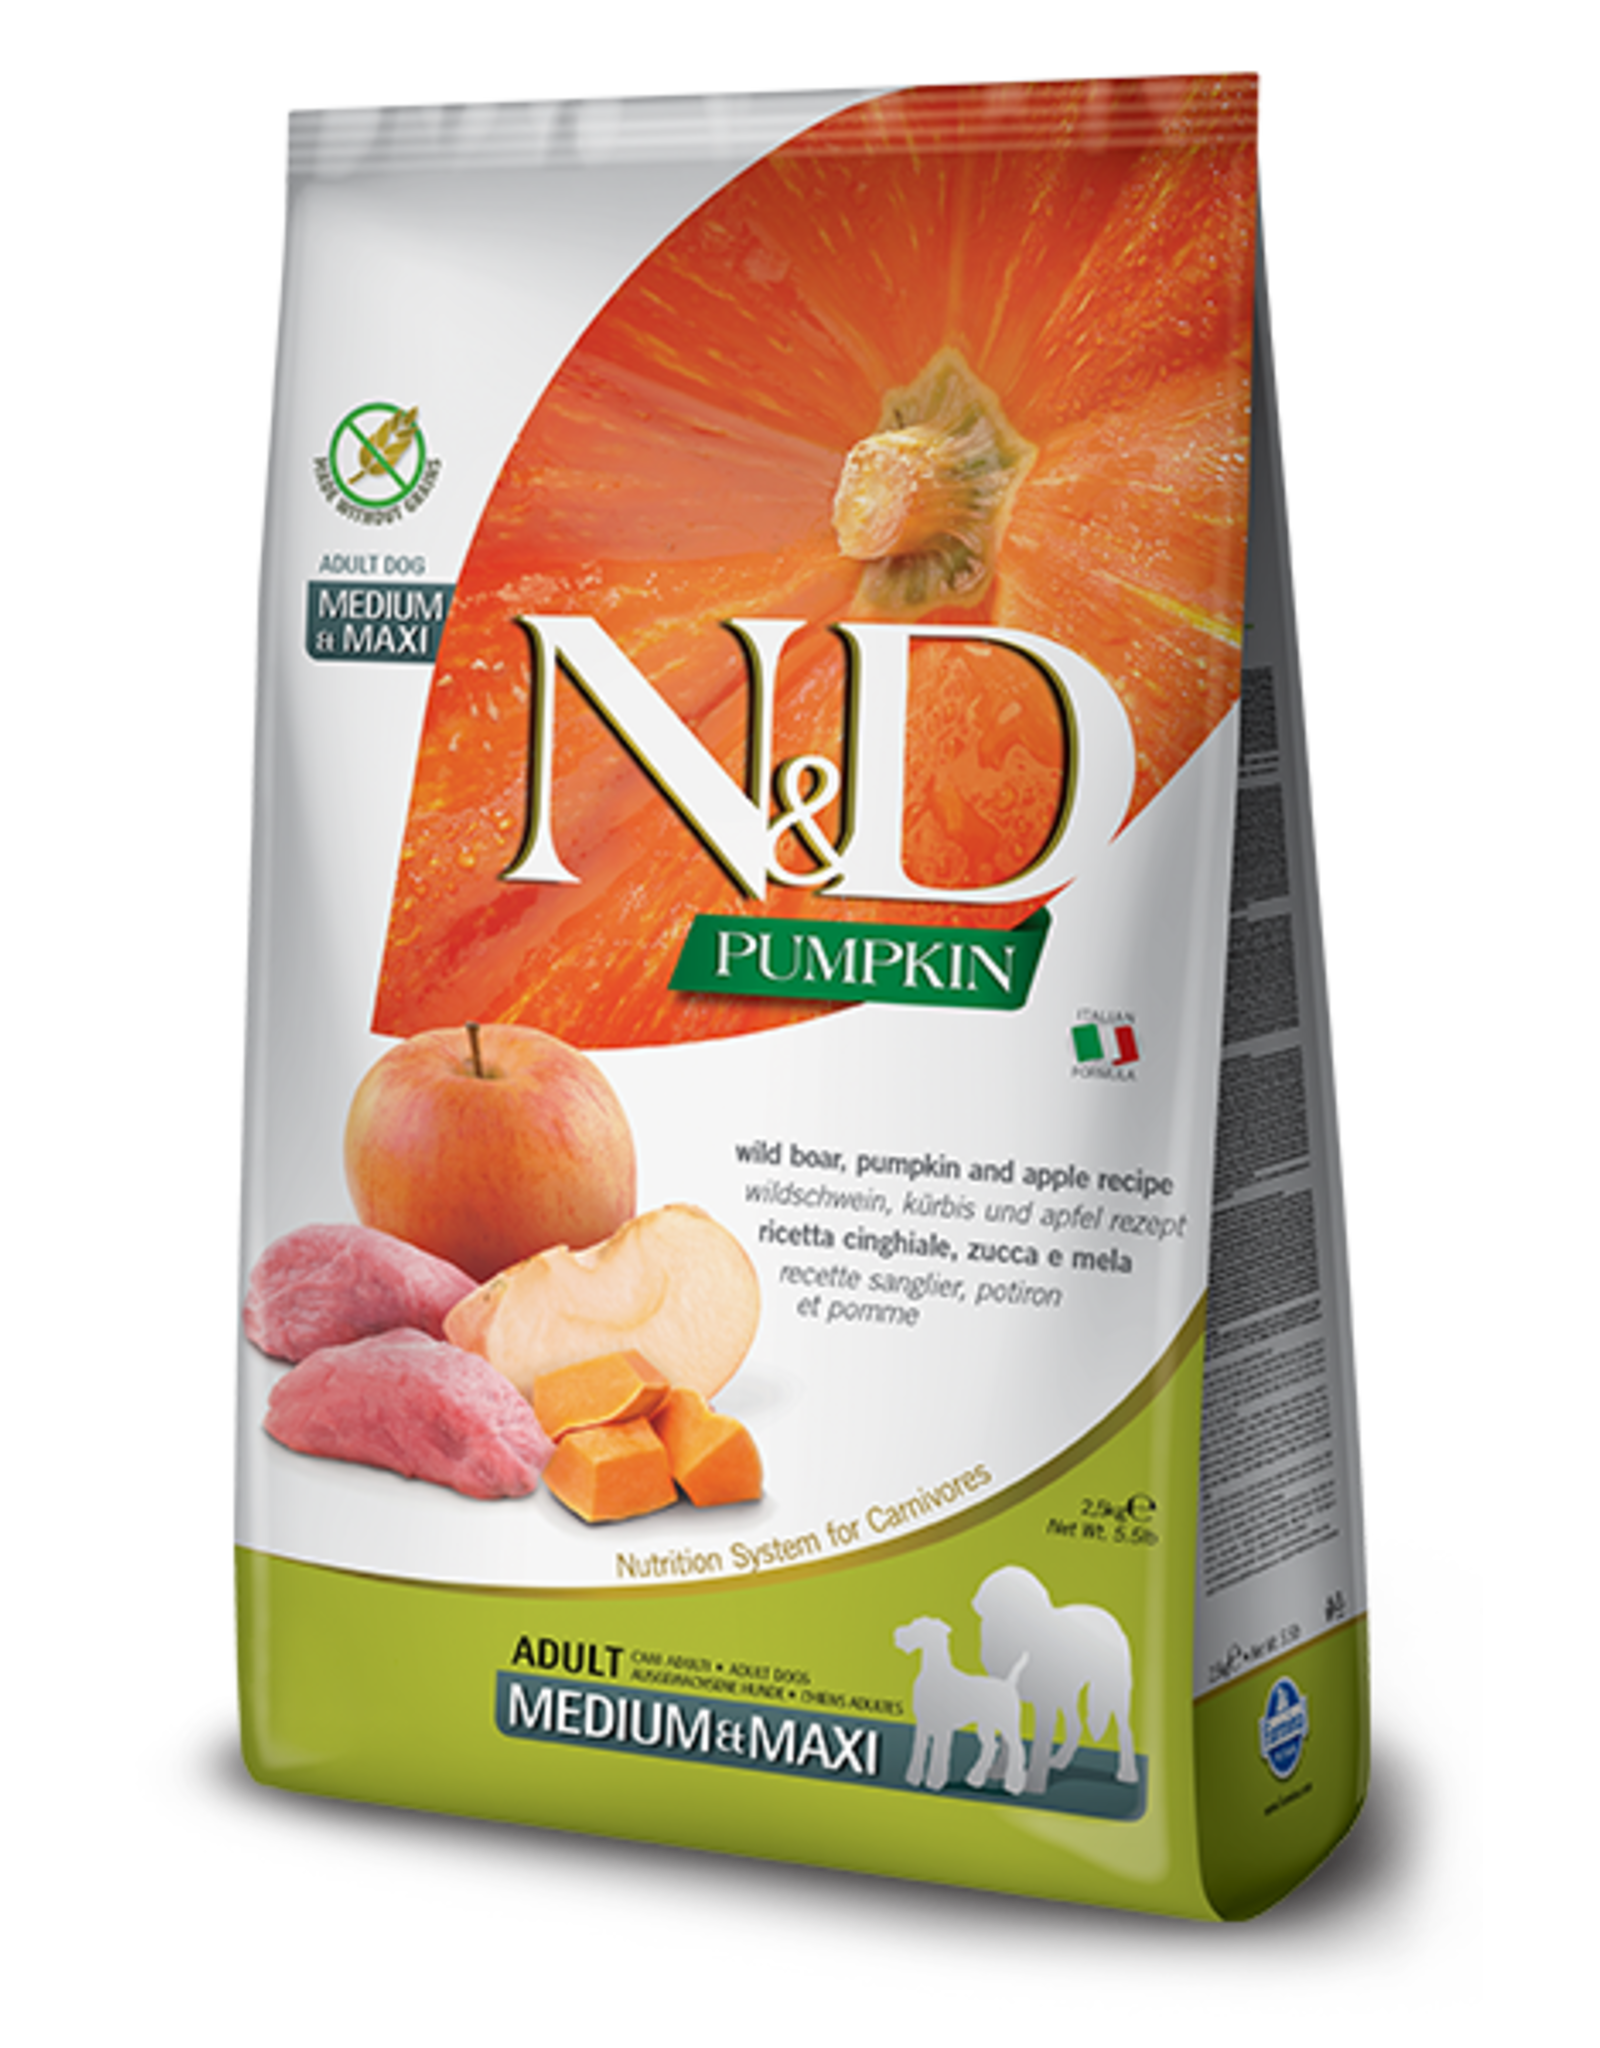 Farmina N&D Dog - Pumpkin & Boar Adult Med/Max 5.5lb